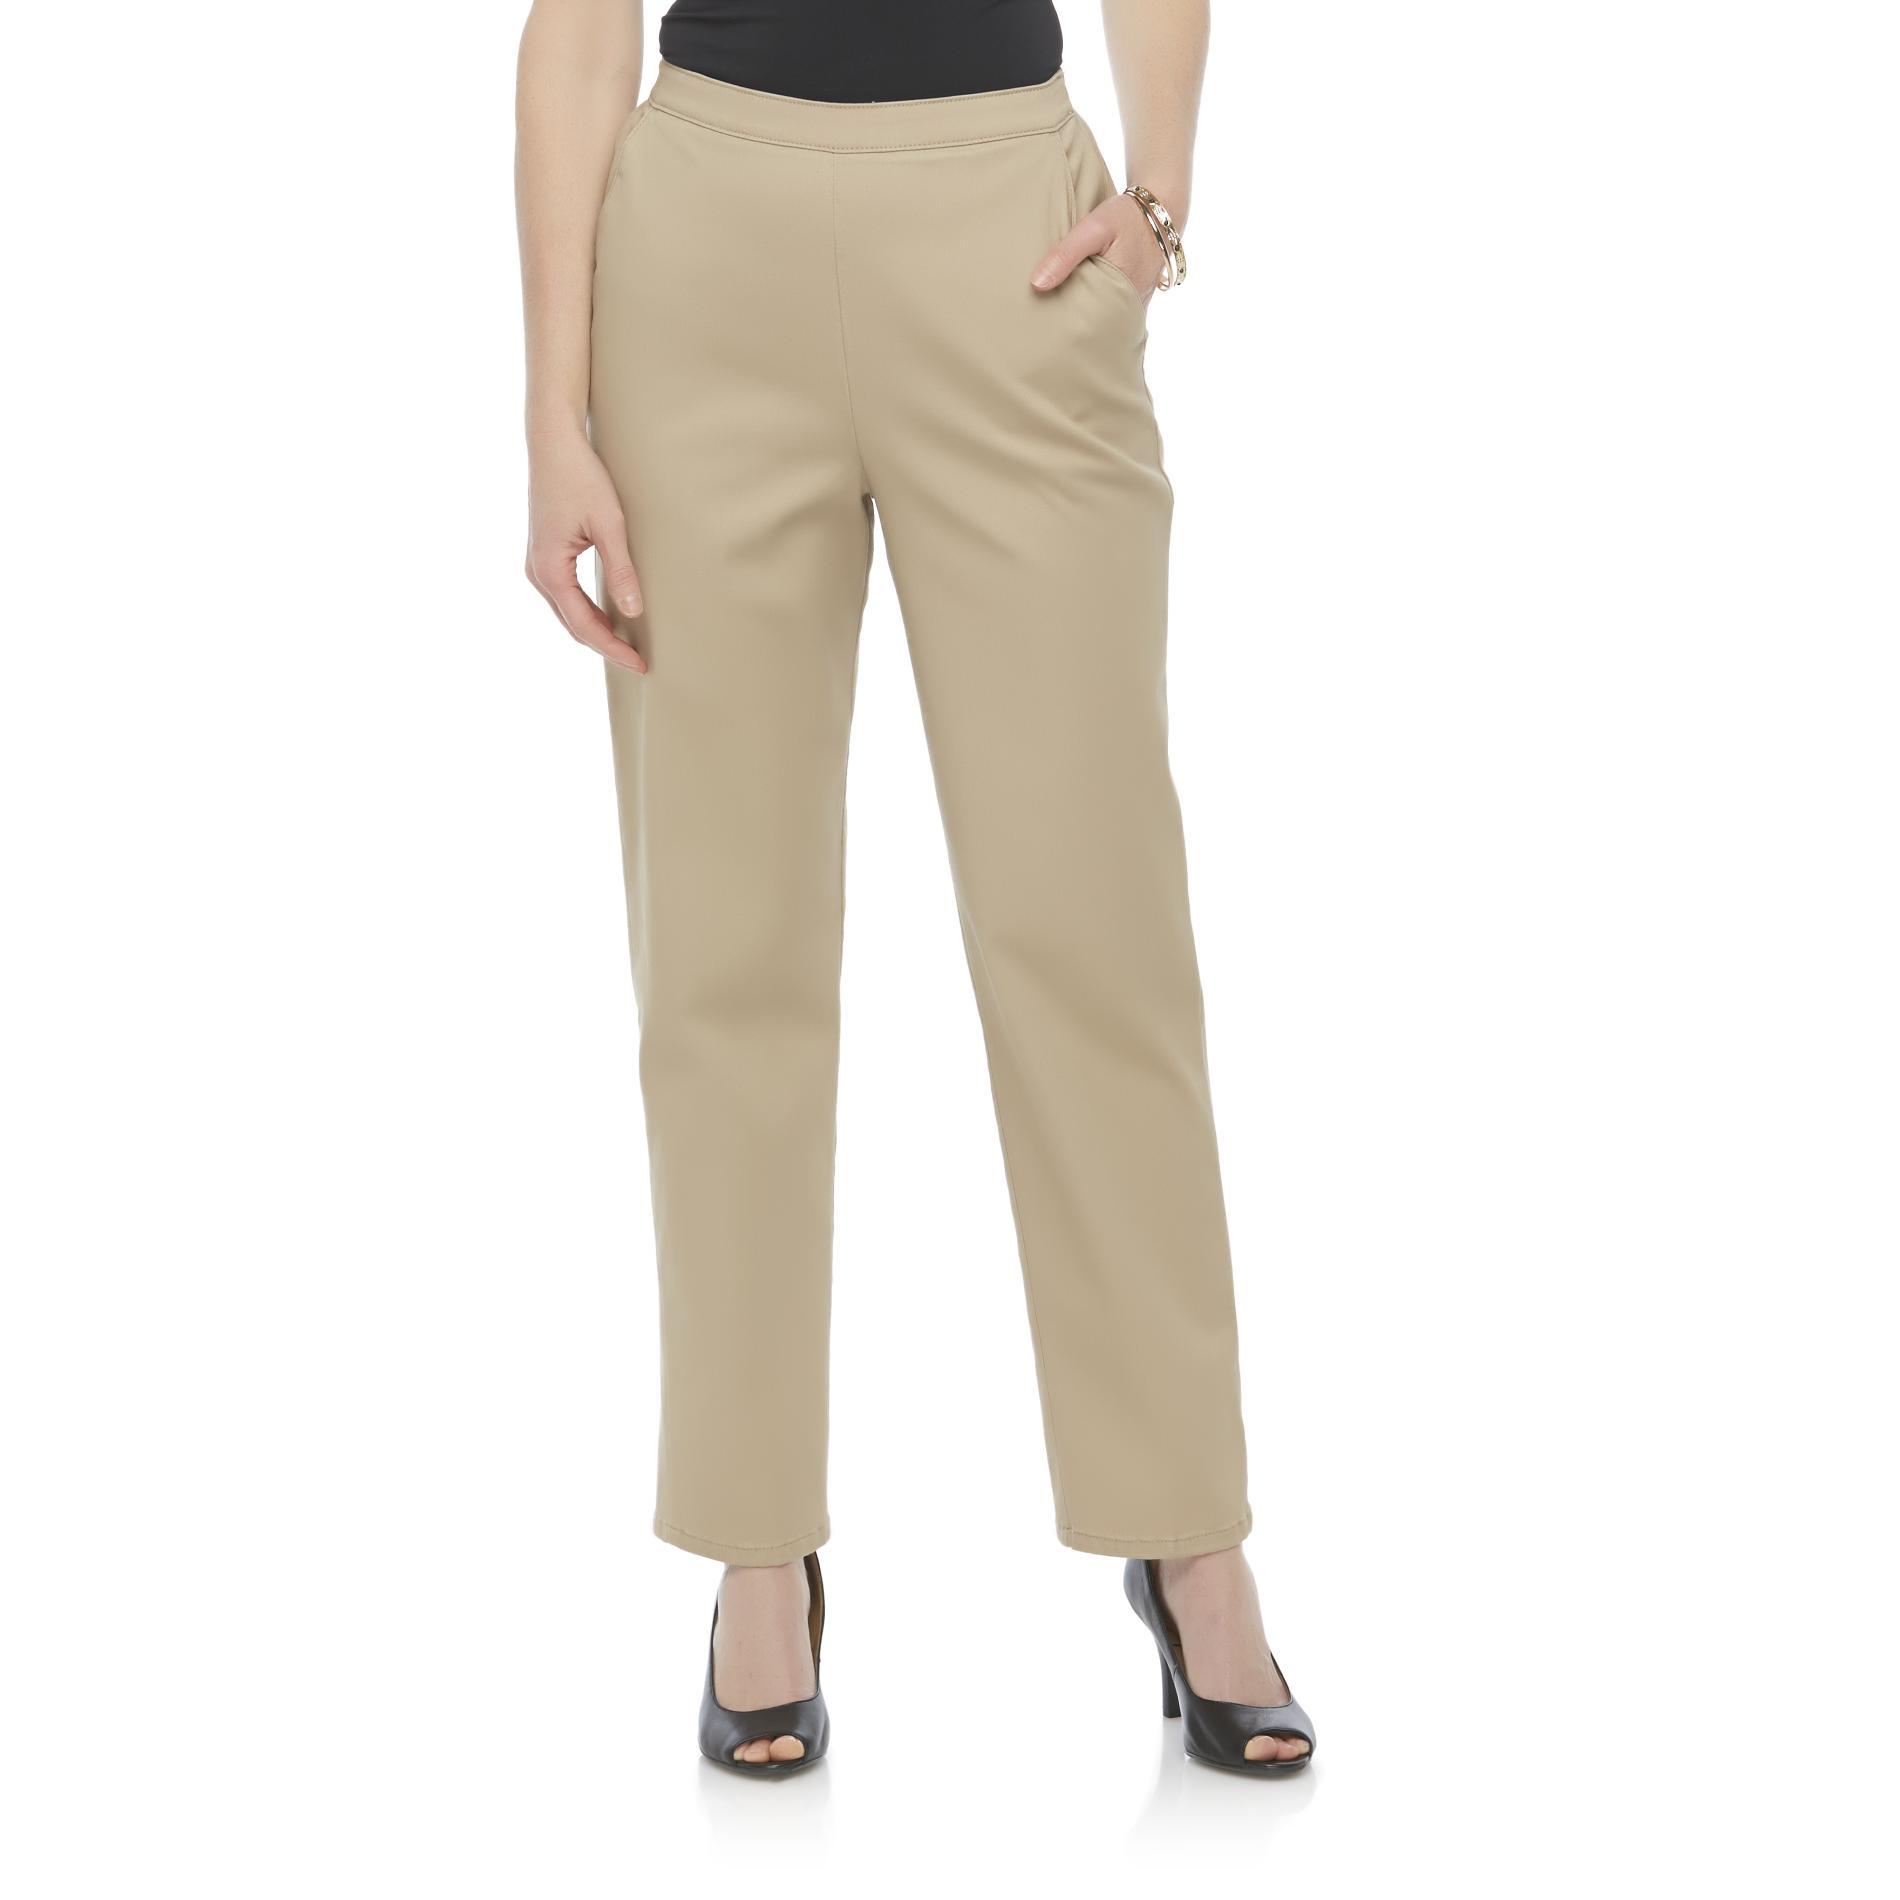 Laura Scott Women' Comfort Waist Khaki Pants